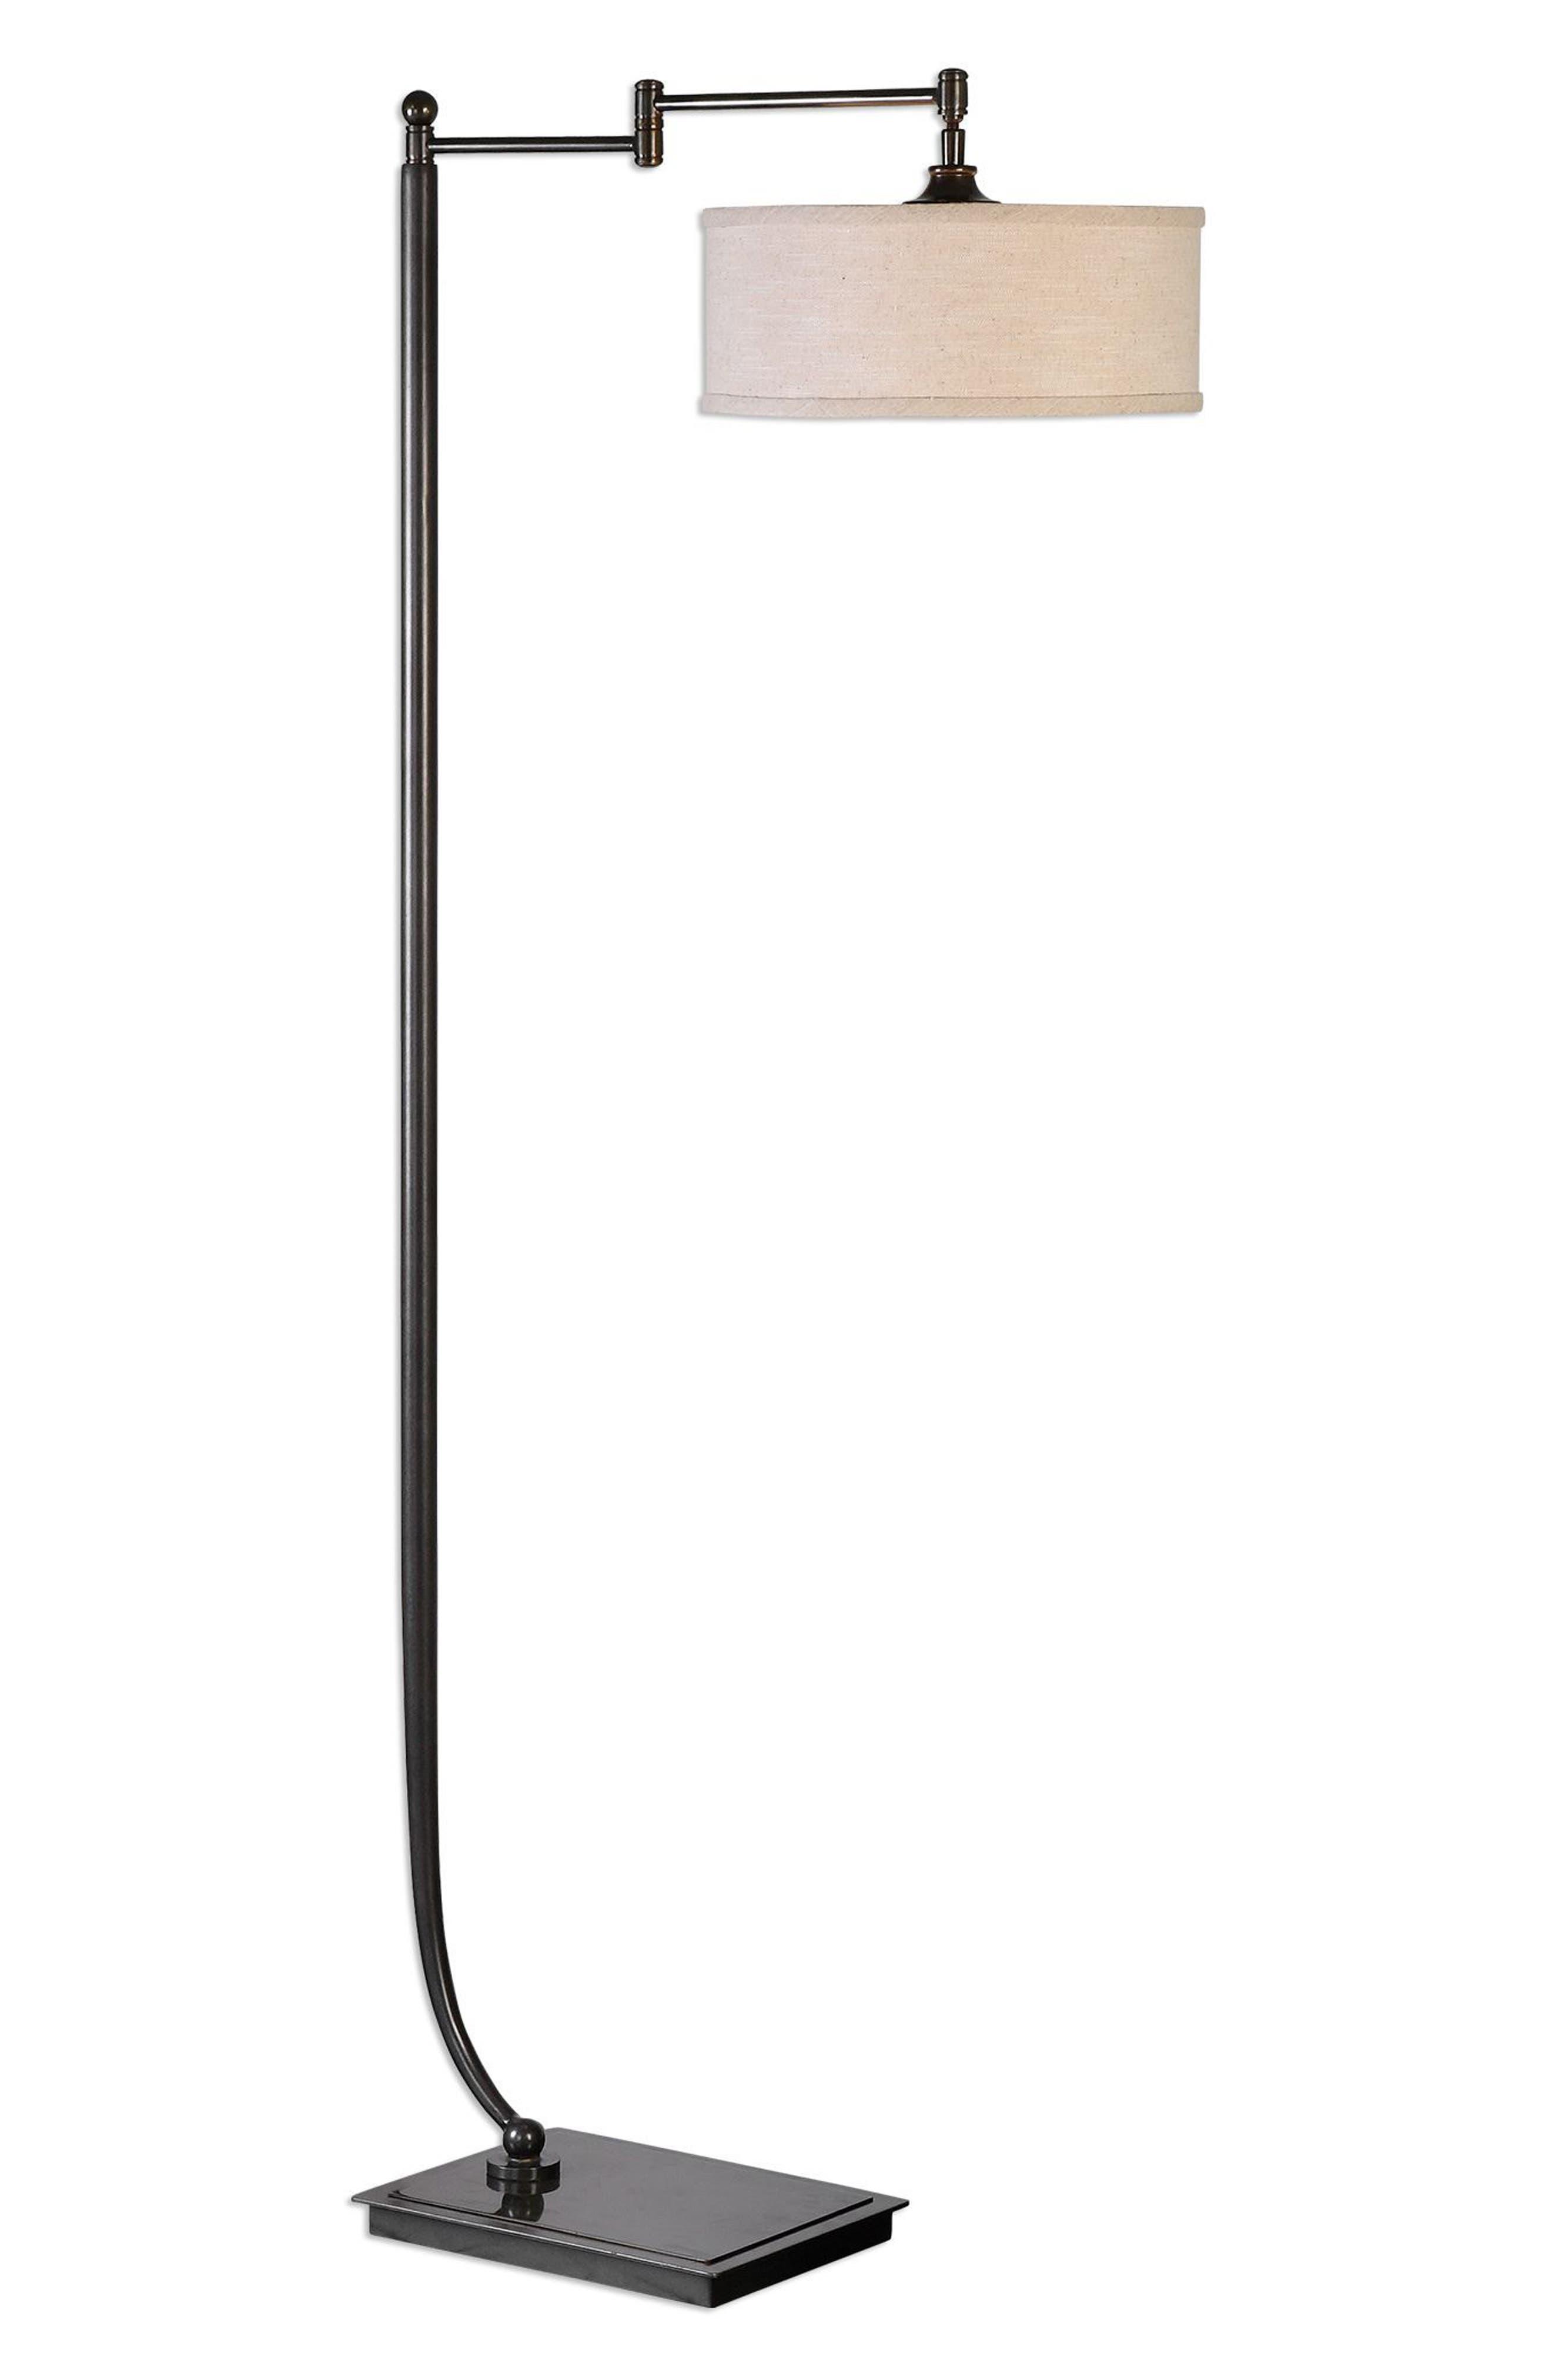 Alternate Image 1 Selected - Uttermost Lamine Floor Lamp